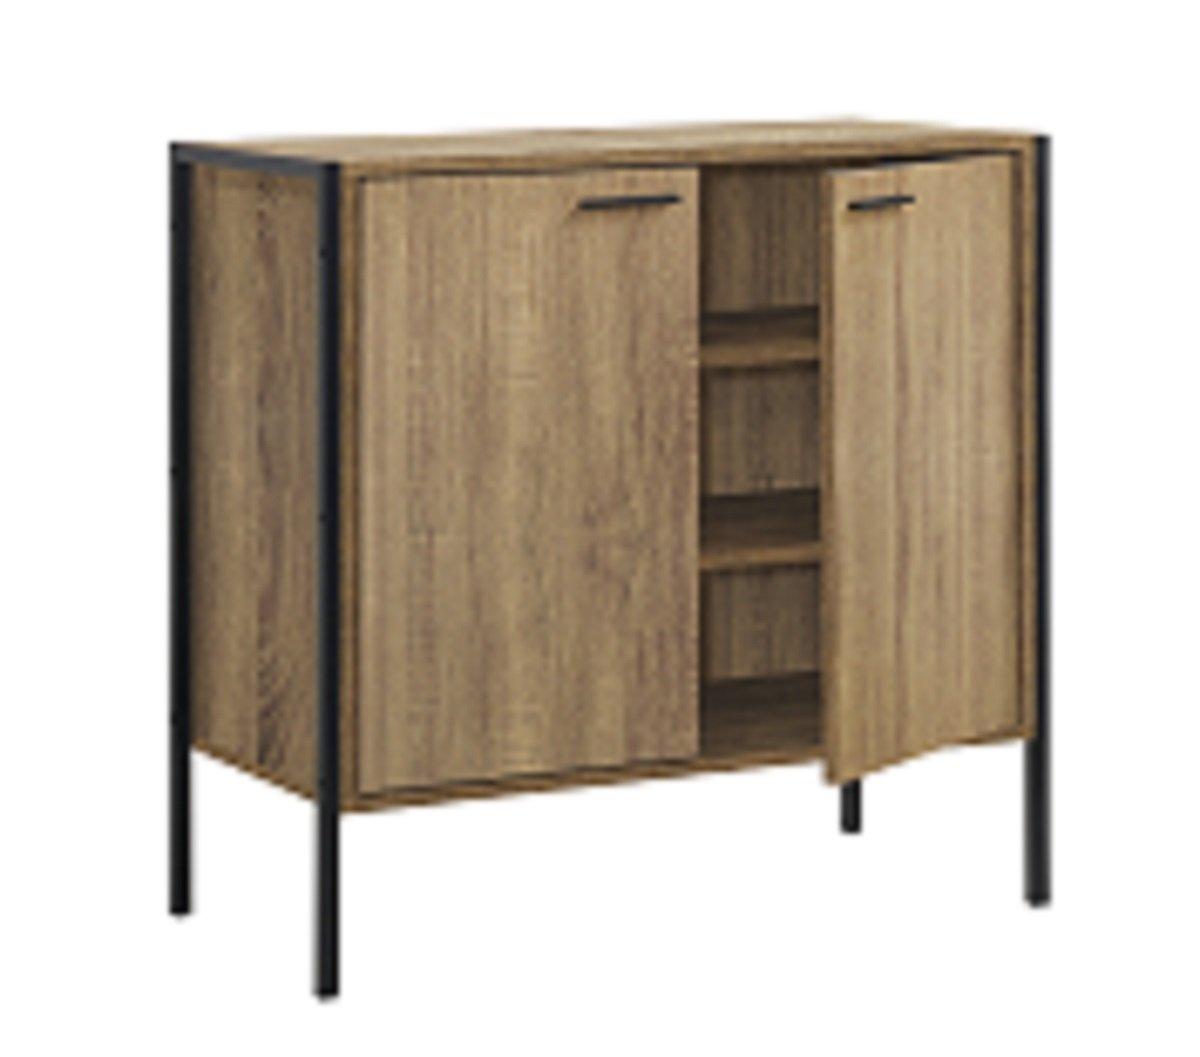 Timber Art Design Stretton Urban Dining Room 2 Door Sideboard Server Storage Unit Rustic Industrial Medium Oak Effect Timber Art Design UK